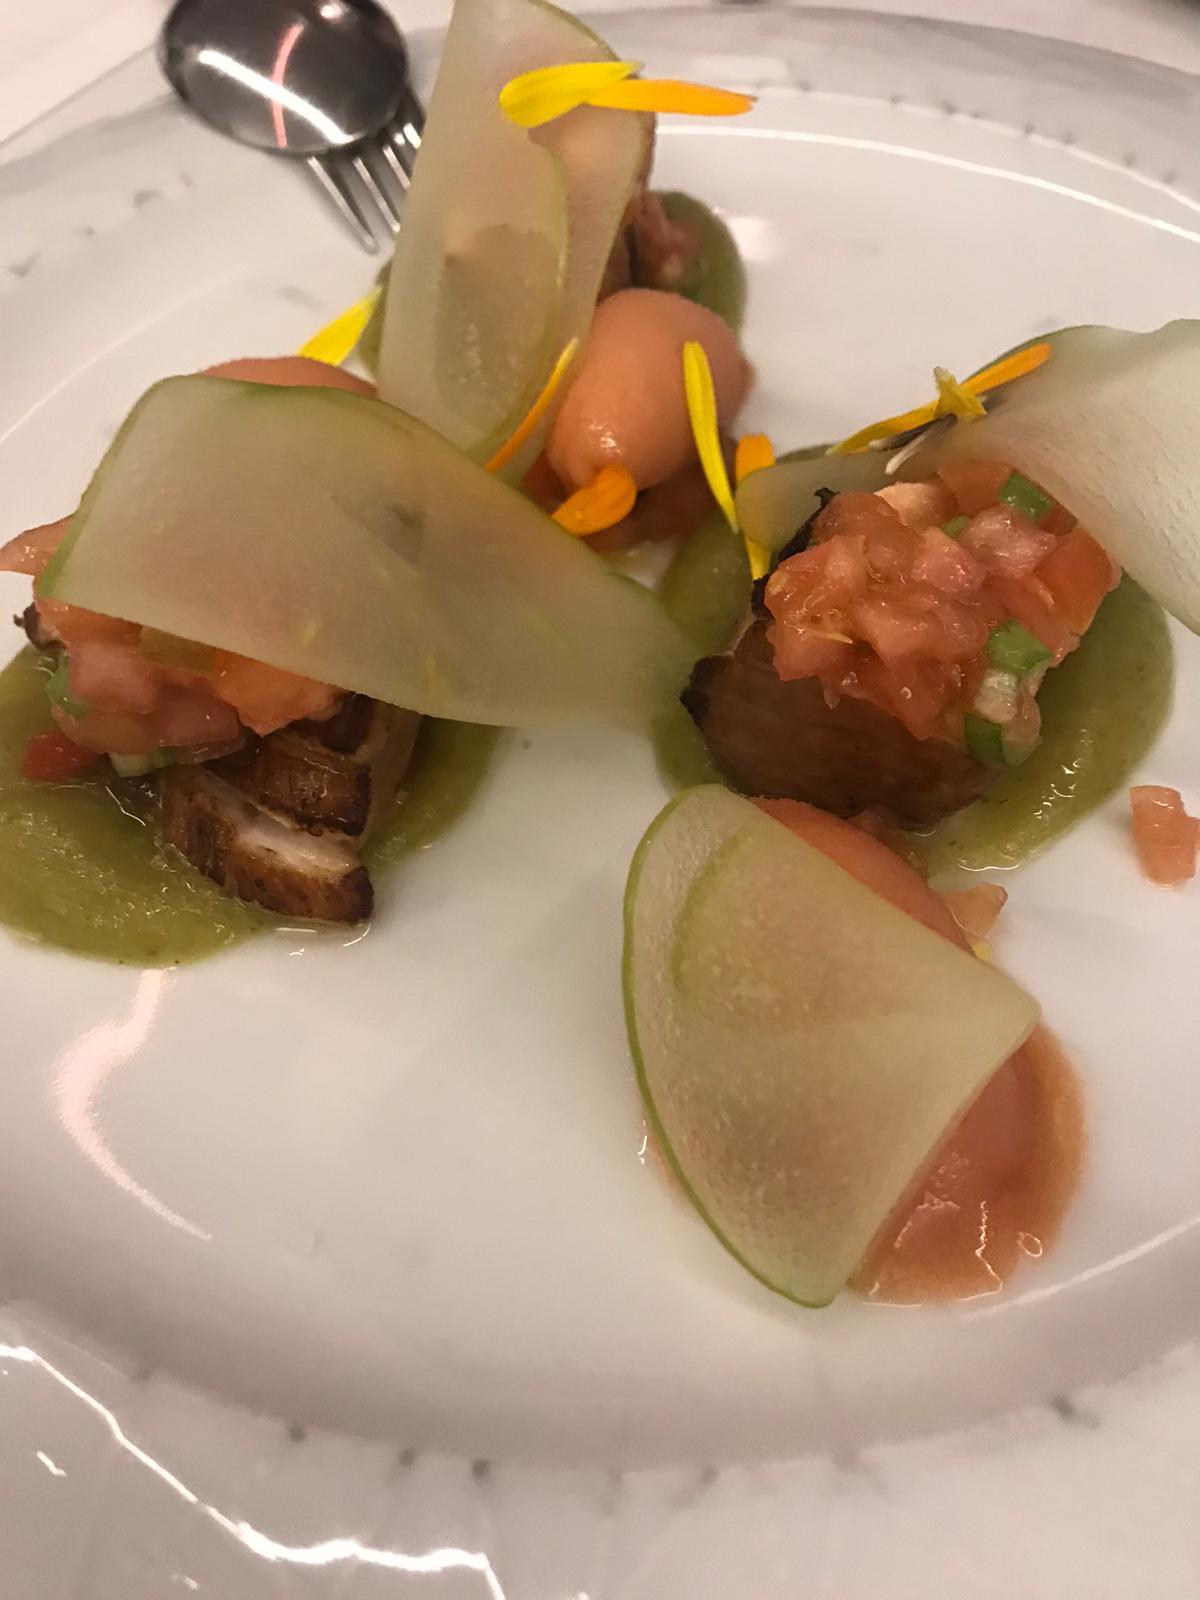 Reseña gastronómica: Restaurante Entrevins de Valencia 3